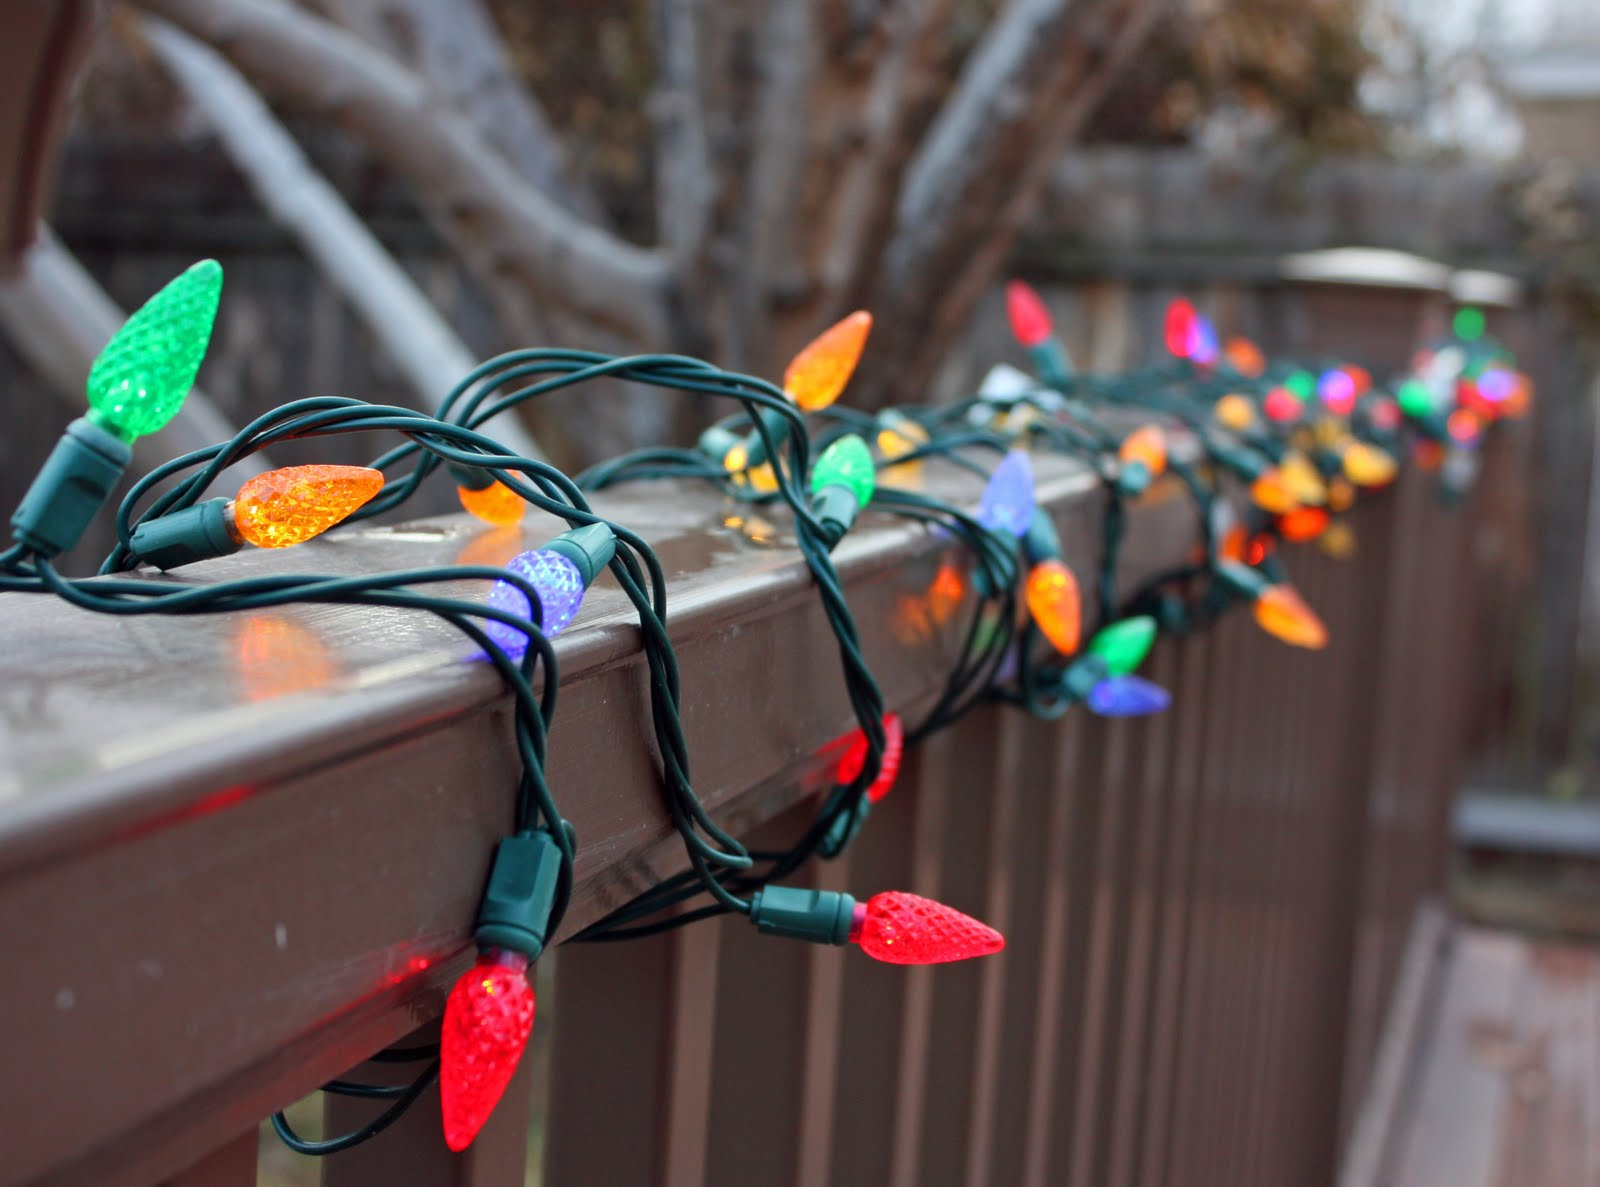 railing lights.jpg